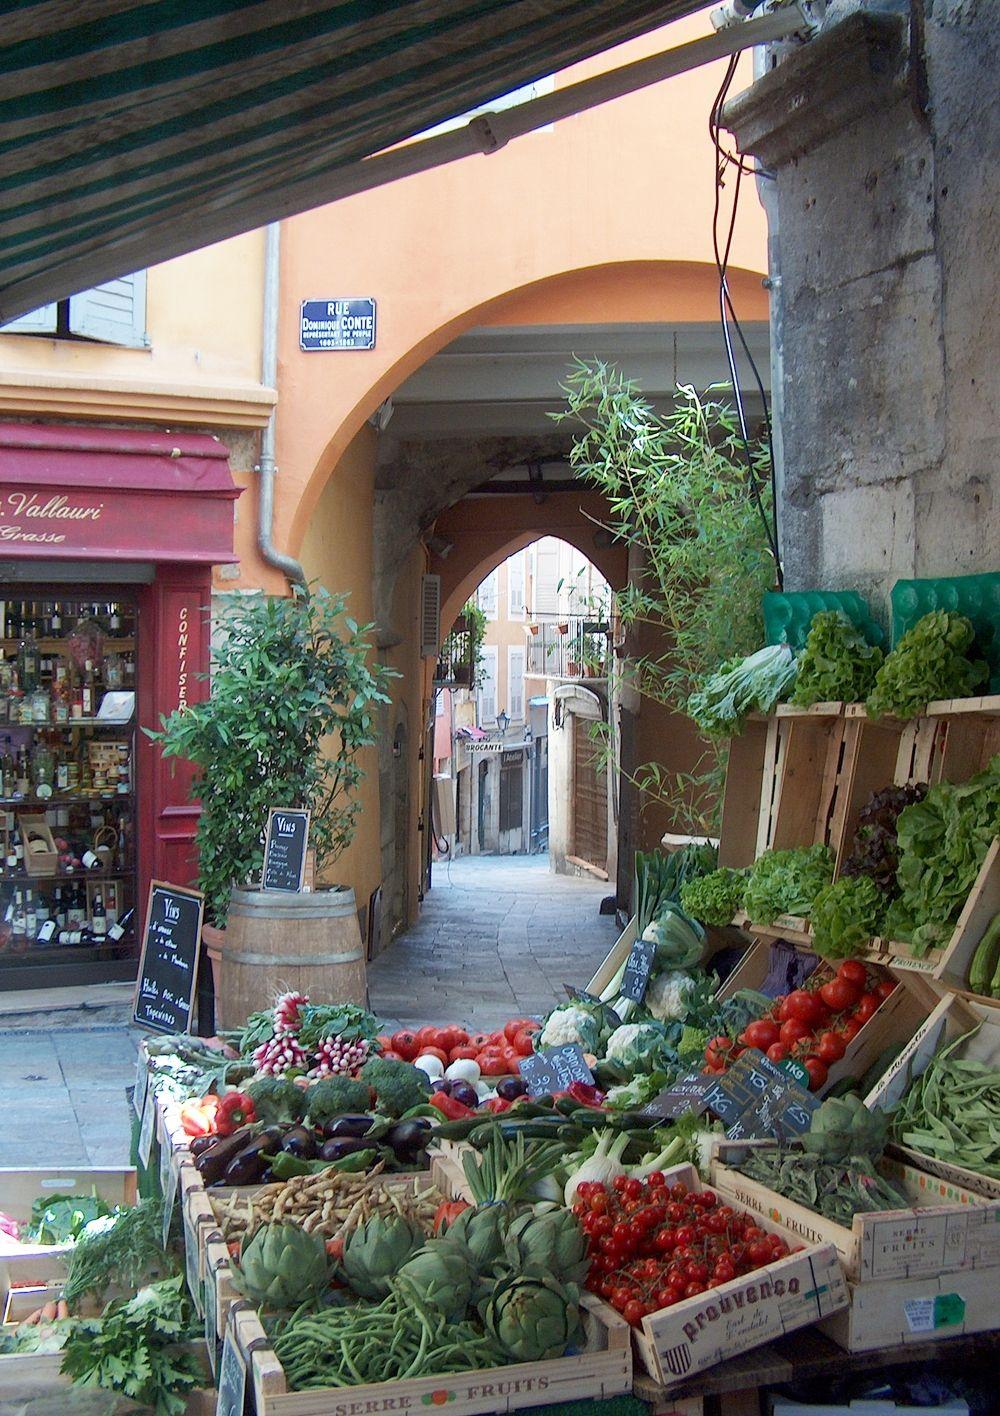 Typical marketplace in Mediterrean